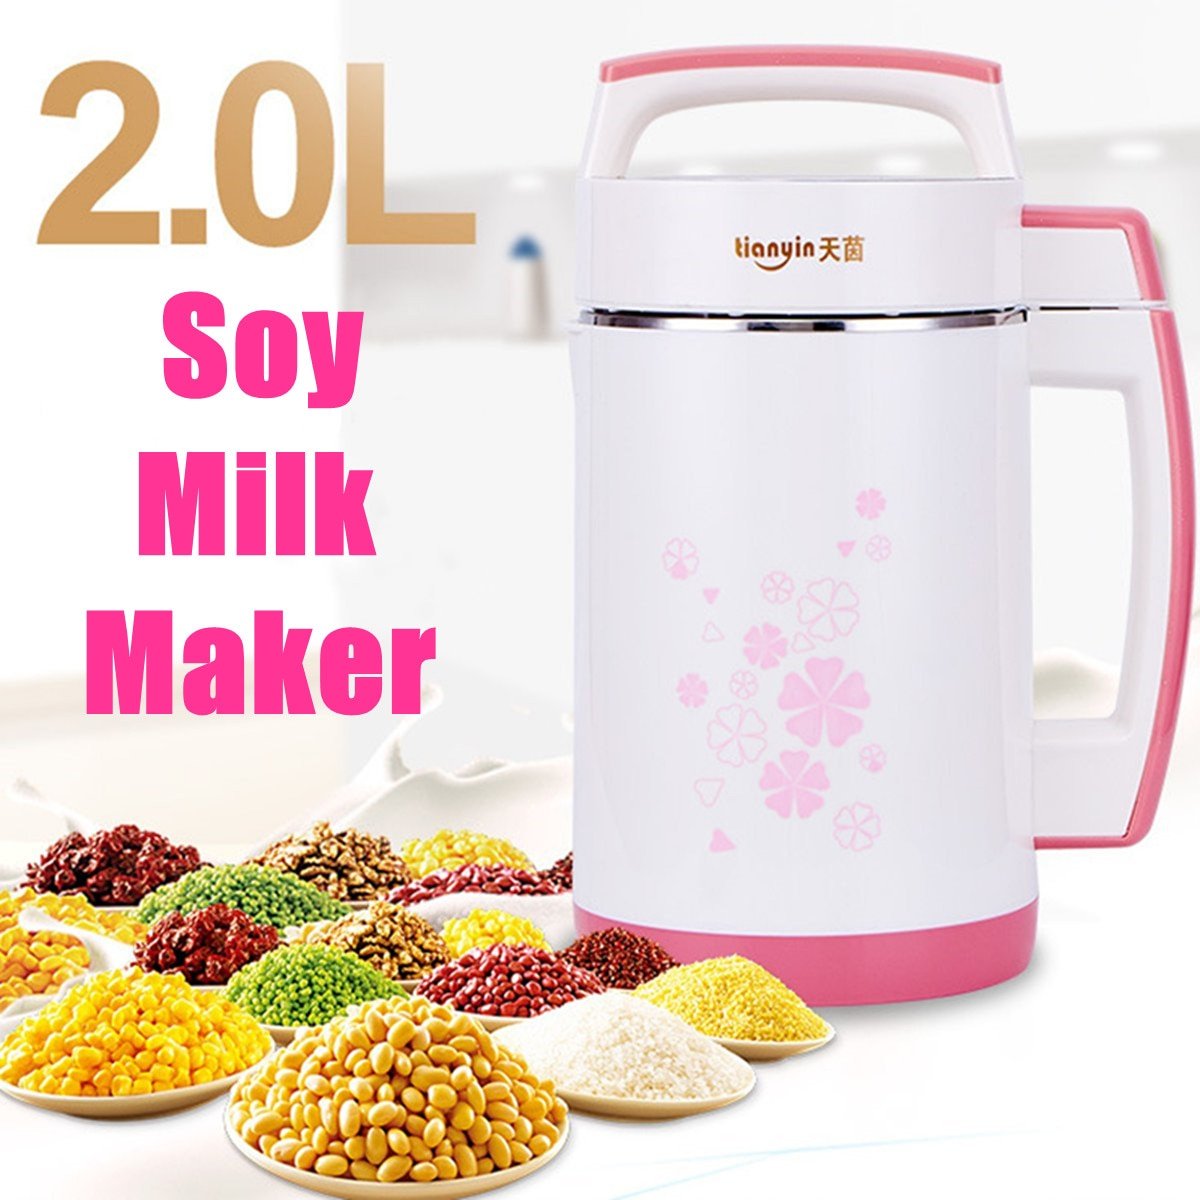 2L תכליתי מכונה מערבבים אורז יצרנית דבק נירוסטה מסנן-משלוח אוטומטי חימום פולי סויה חלב מסחטה 800W